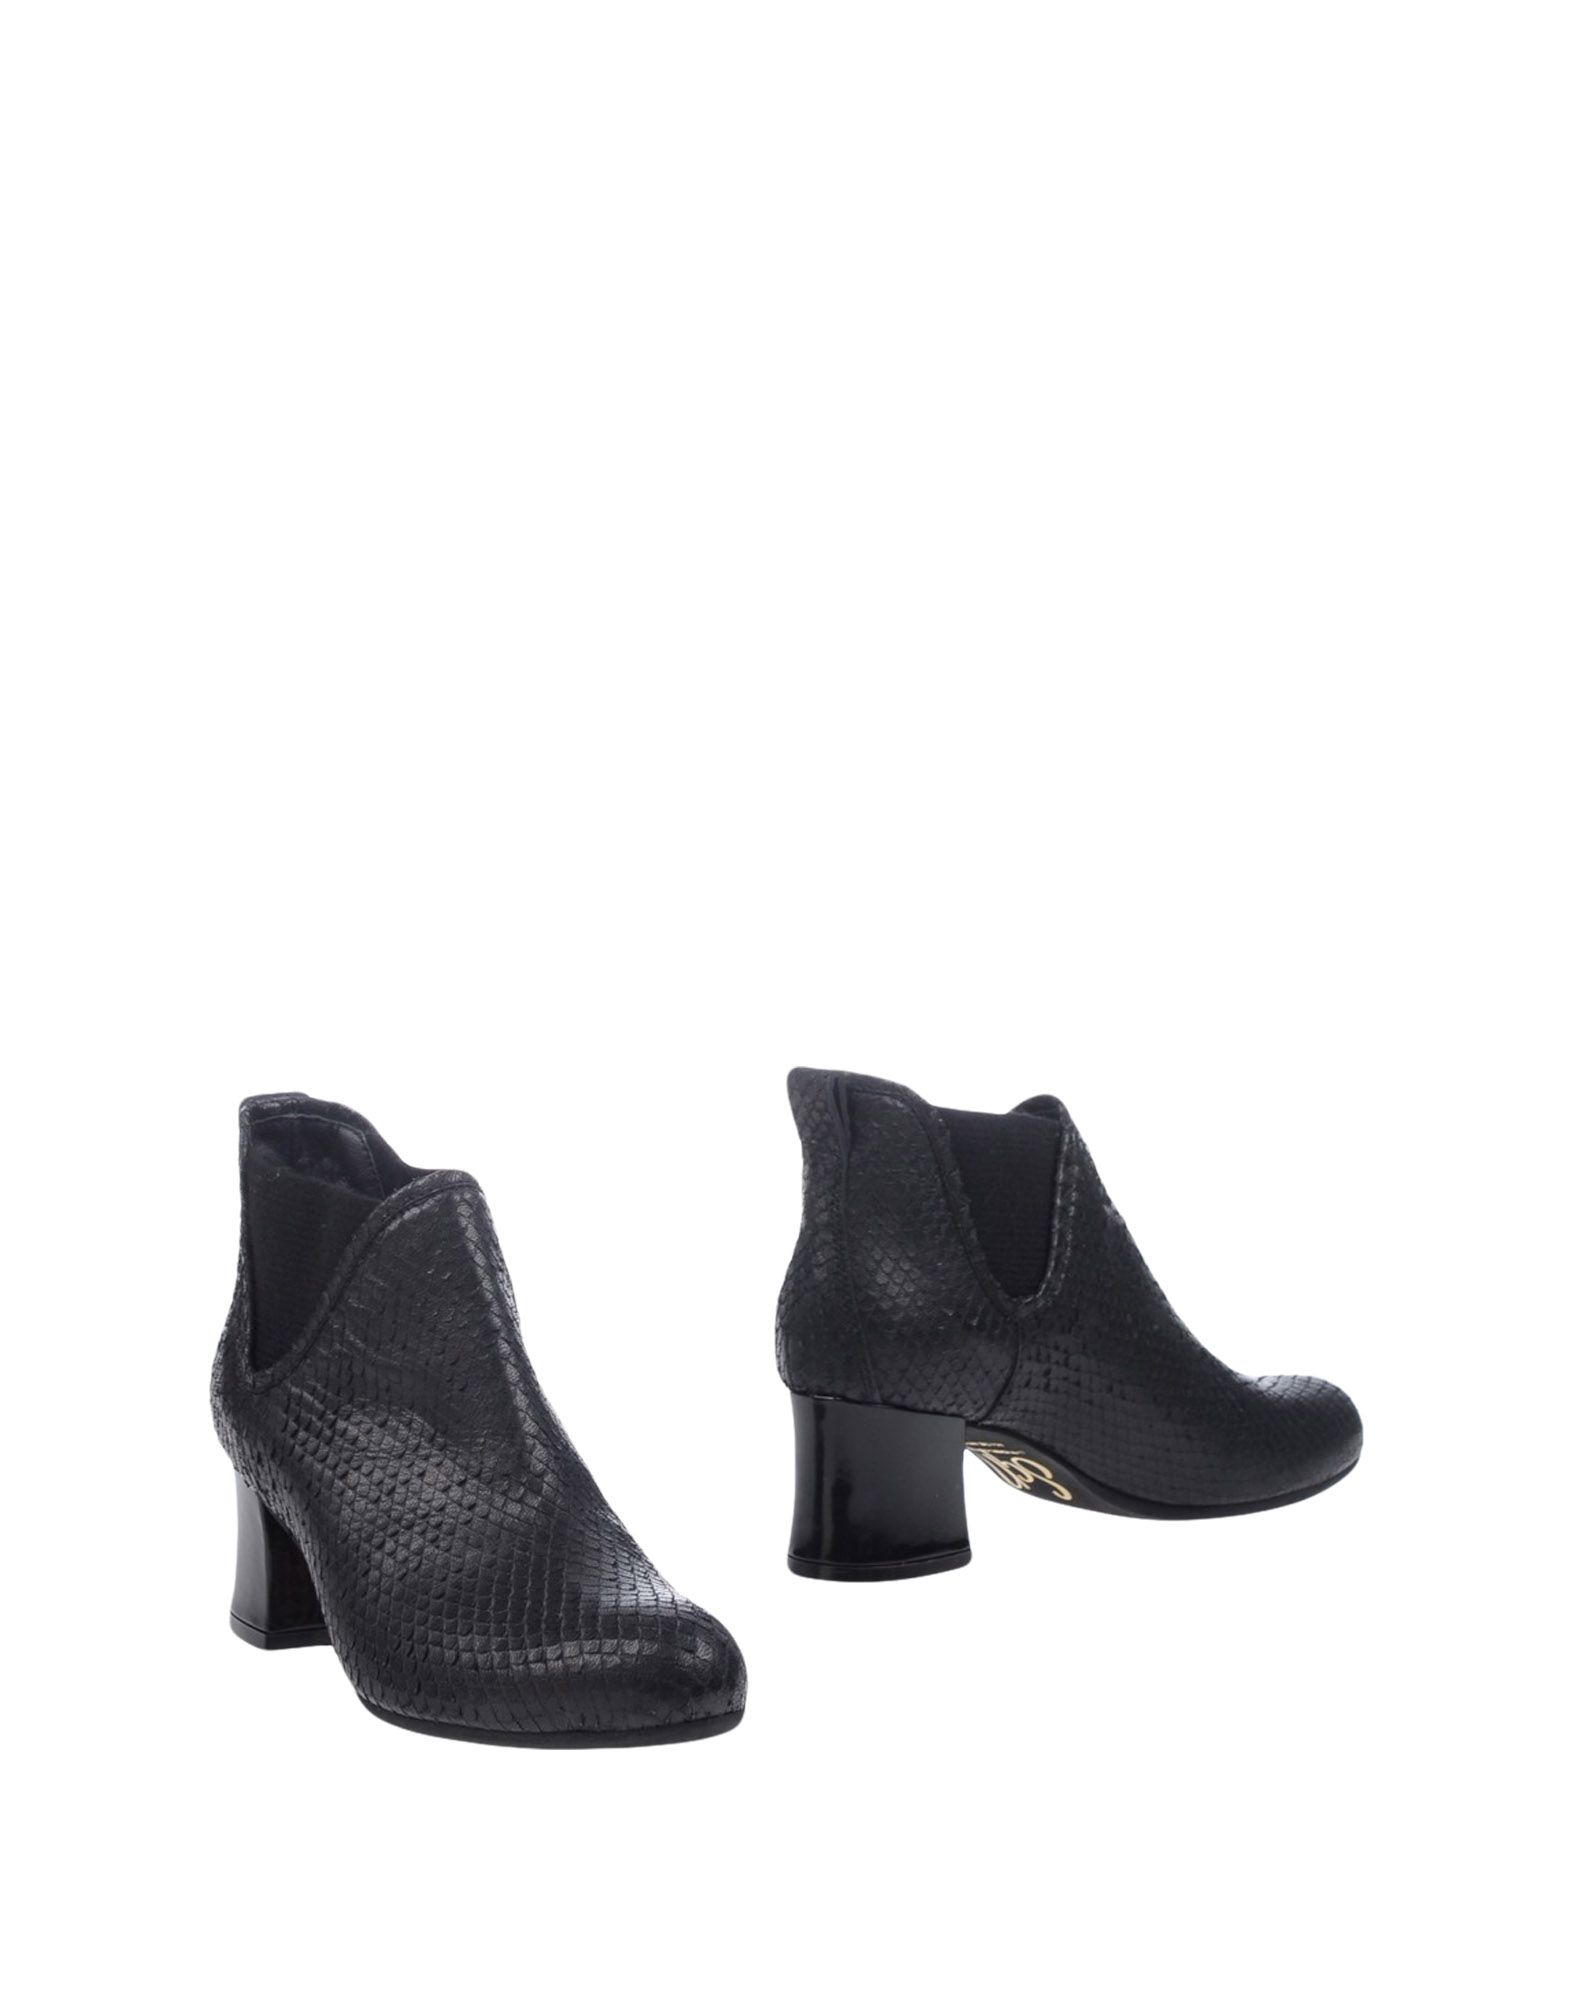 Stilvolle billige Stiefelette Schuhe Sgn Giancarlo Paoli Stiefelette billige Damen  11279329FV 563fac